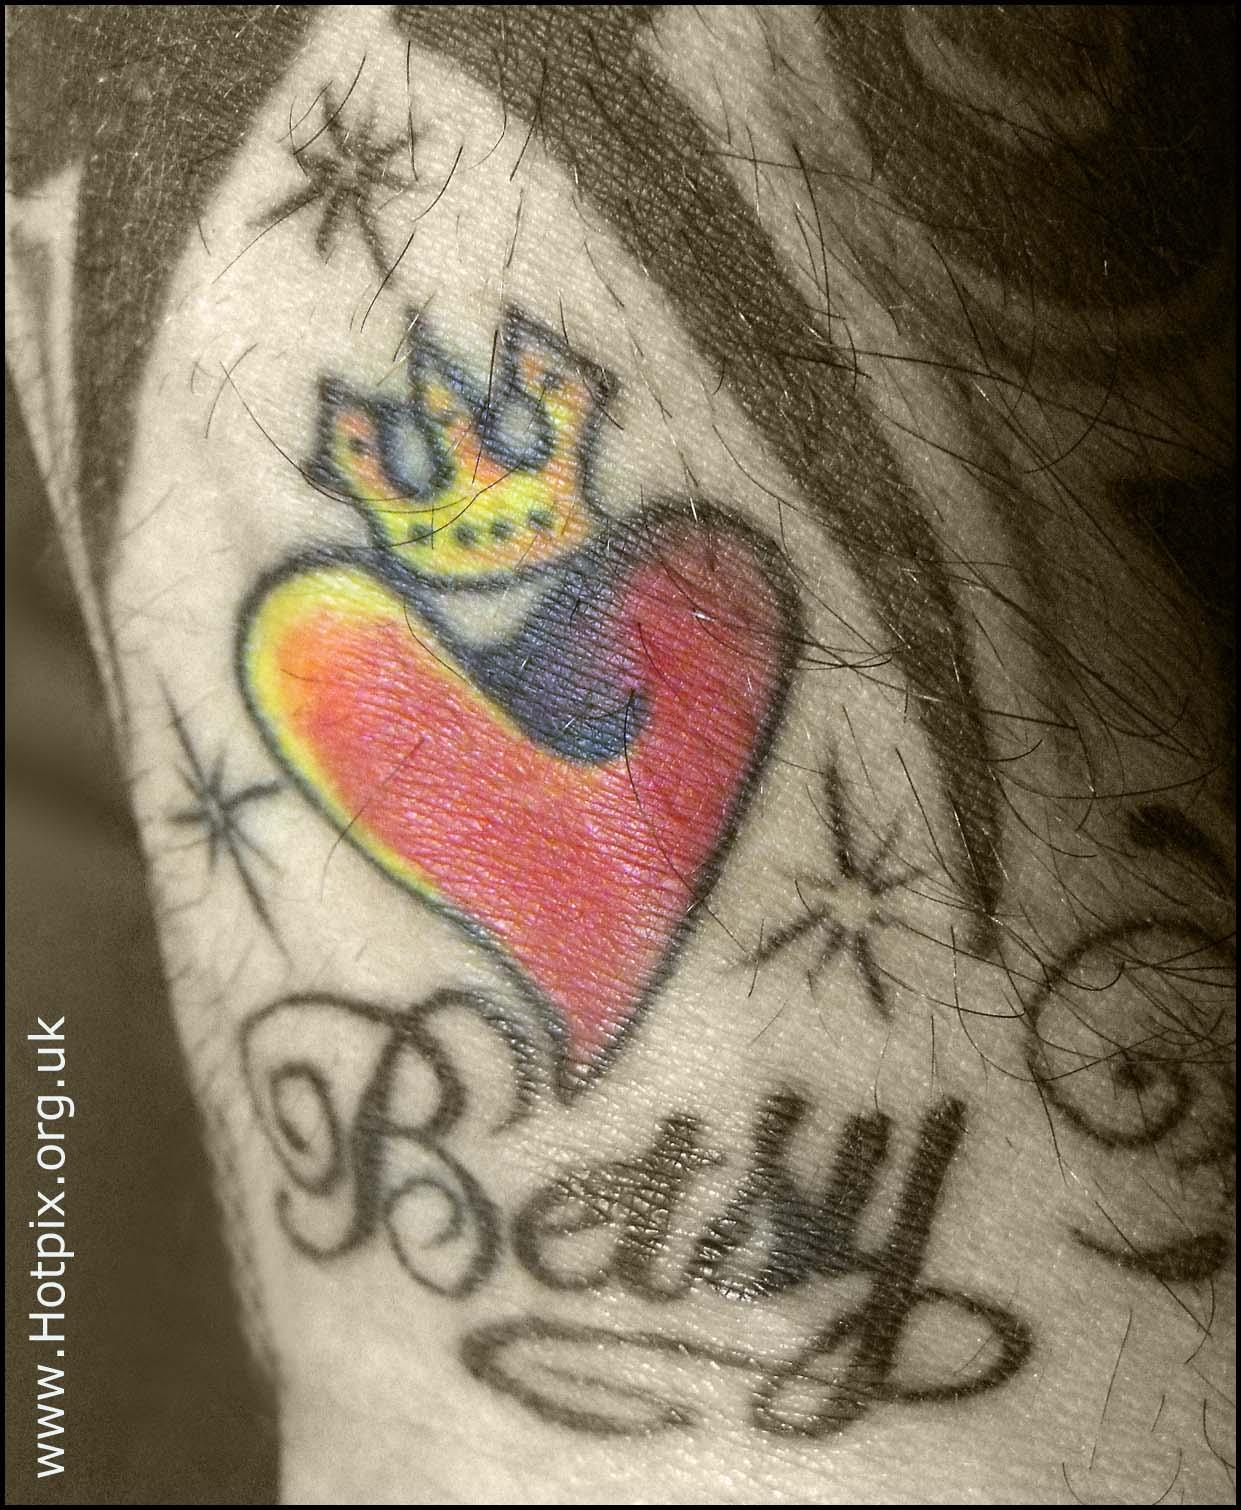 Betsy,Tattoo,tat2,tatoo,tato,arm,coloured,sepia,black,white,BW,mono,monchrome,ink,skin,selective,color,colour,drinker,drinking,man,tribal,tribel,inkintheskin,s1500,fuji,fujifilm,tatuaje,\u0442\u0430\u0442\u0443\u0438\u0440\u043e\u0432\u043a\u0430,T\u00e4towierung,tatouage,tatoegering,\u7d0b\u8eab\u82b1\u523a,partial,mixed,this photo rocks,Tatuada,tatto,tats,bodyart,body,art,selectivo,couleur,s\u00e9lective,vorgew\u00e4hlte,Farbe,hotpix!